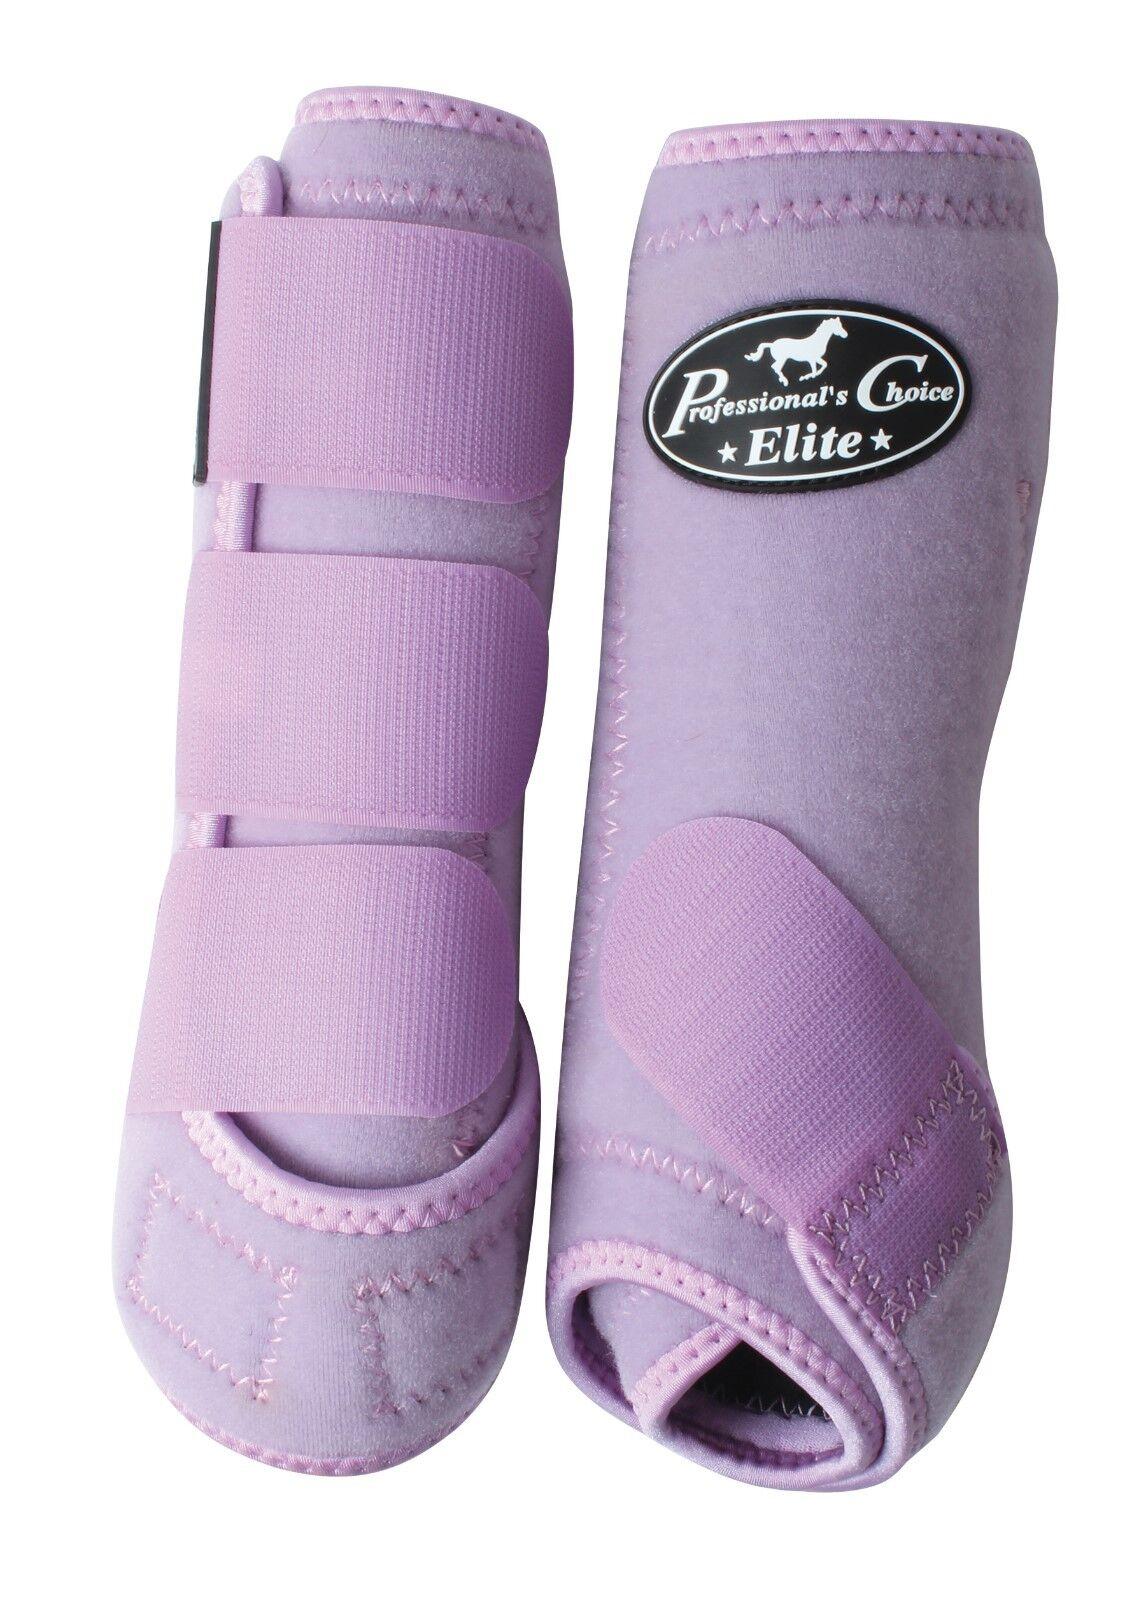 Professional's Choice Ventech Elite valor 4 paquete Sport botas púrpura S Pro Prof